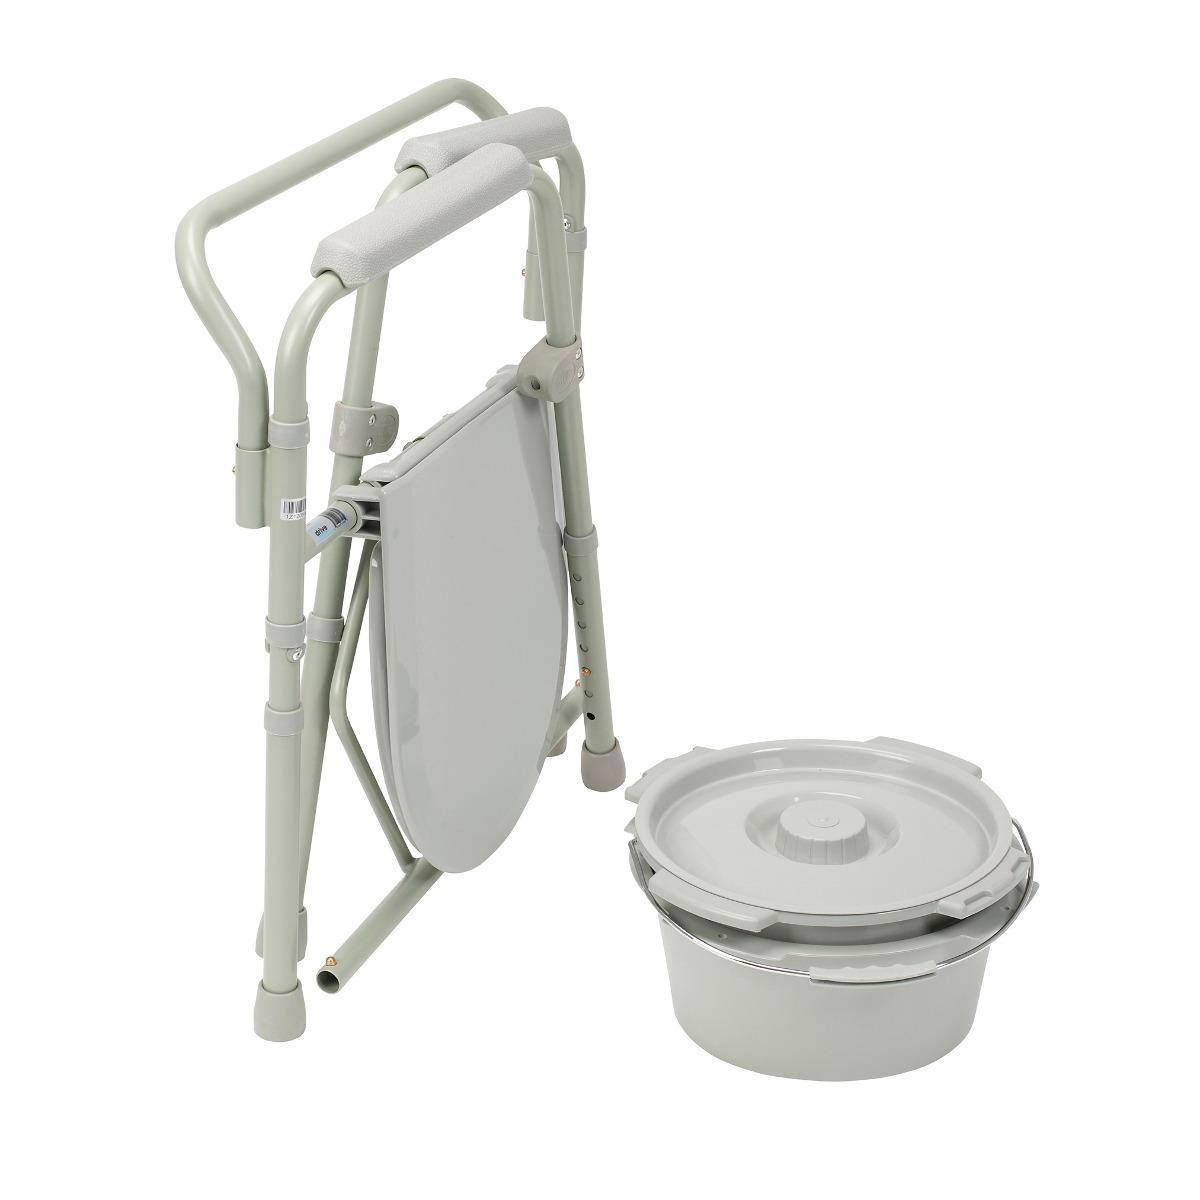 Silla inodoro elevador sanitario water plegable ba o d for Silla vater